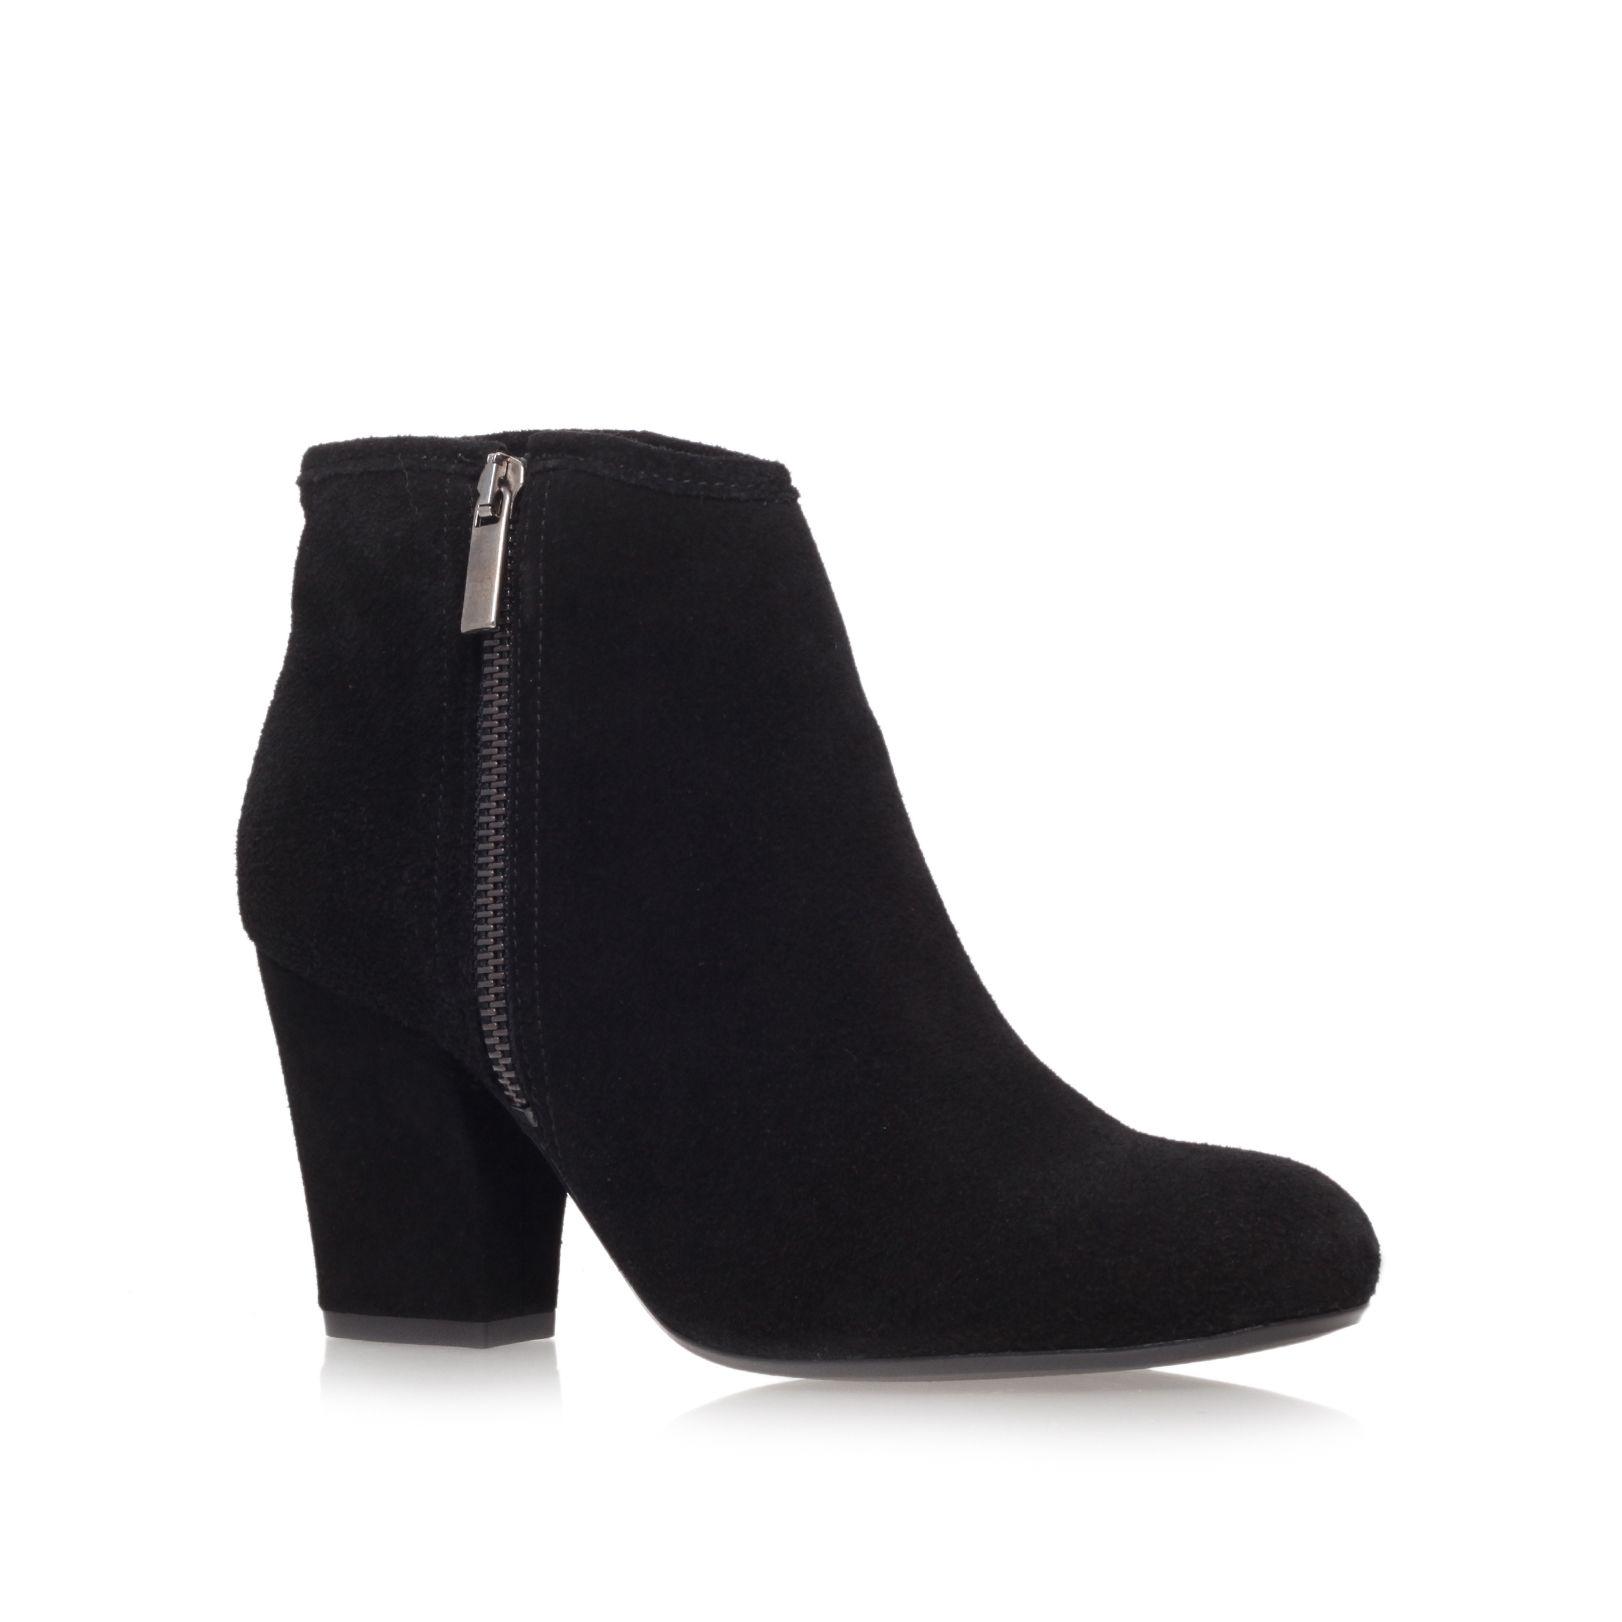 carvela kurt geiger mid heel ankle boots in black lyst